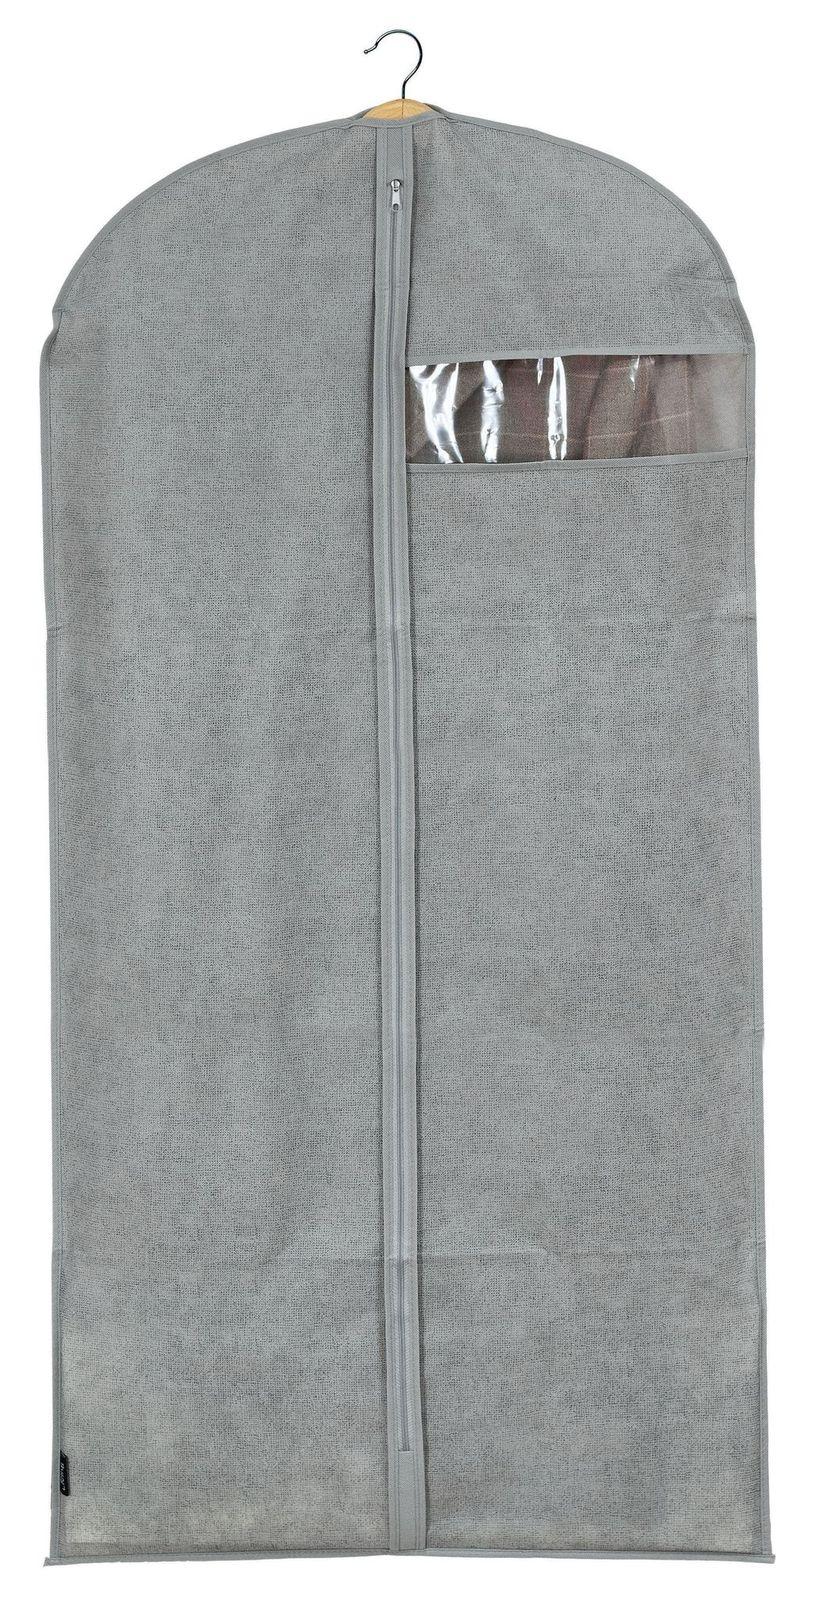 Husa pentru haine cu fermoar, Mais XL Gri, l60xH135 cm imagine